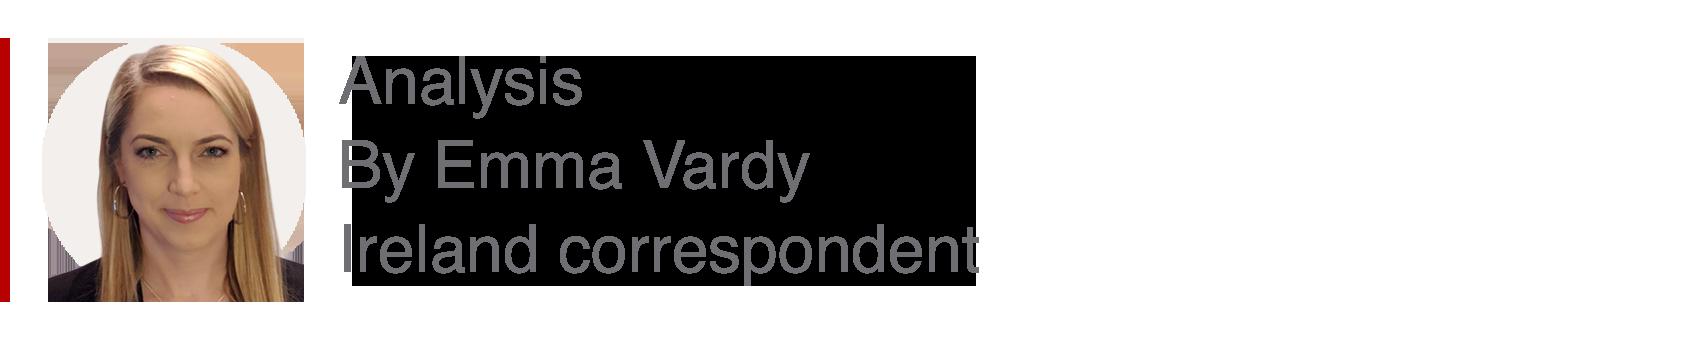 Analysis box by Emma Vardy, Ireland correspondent